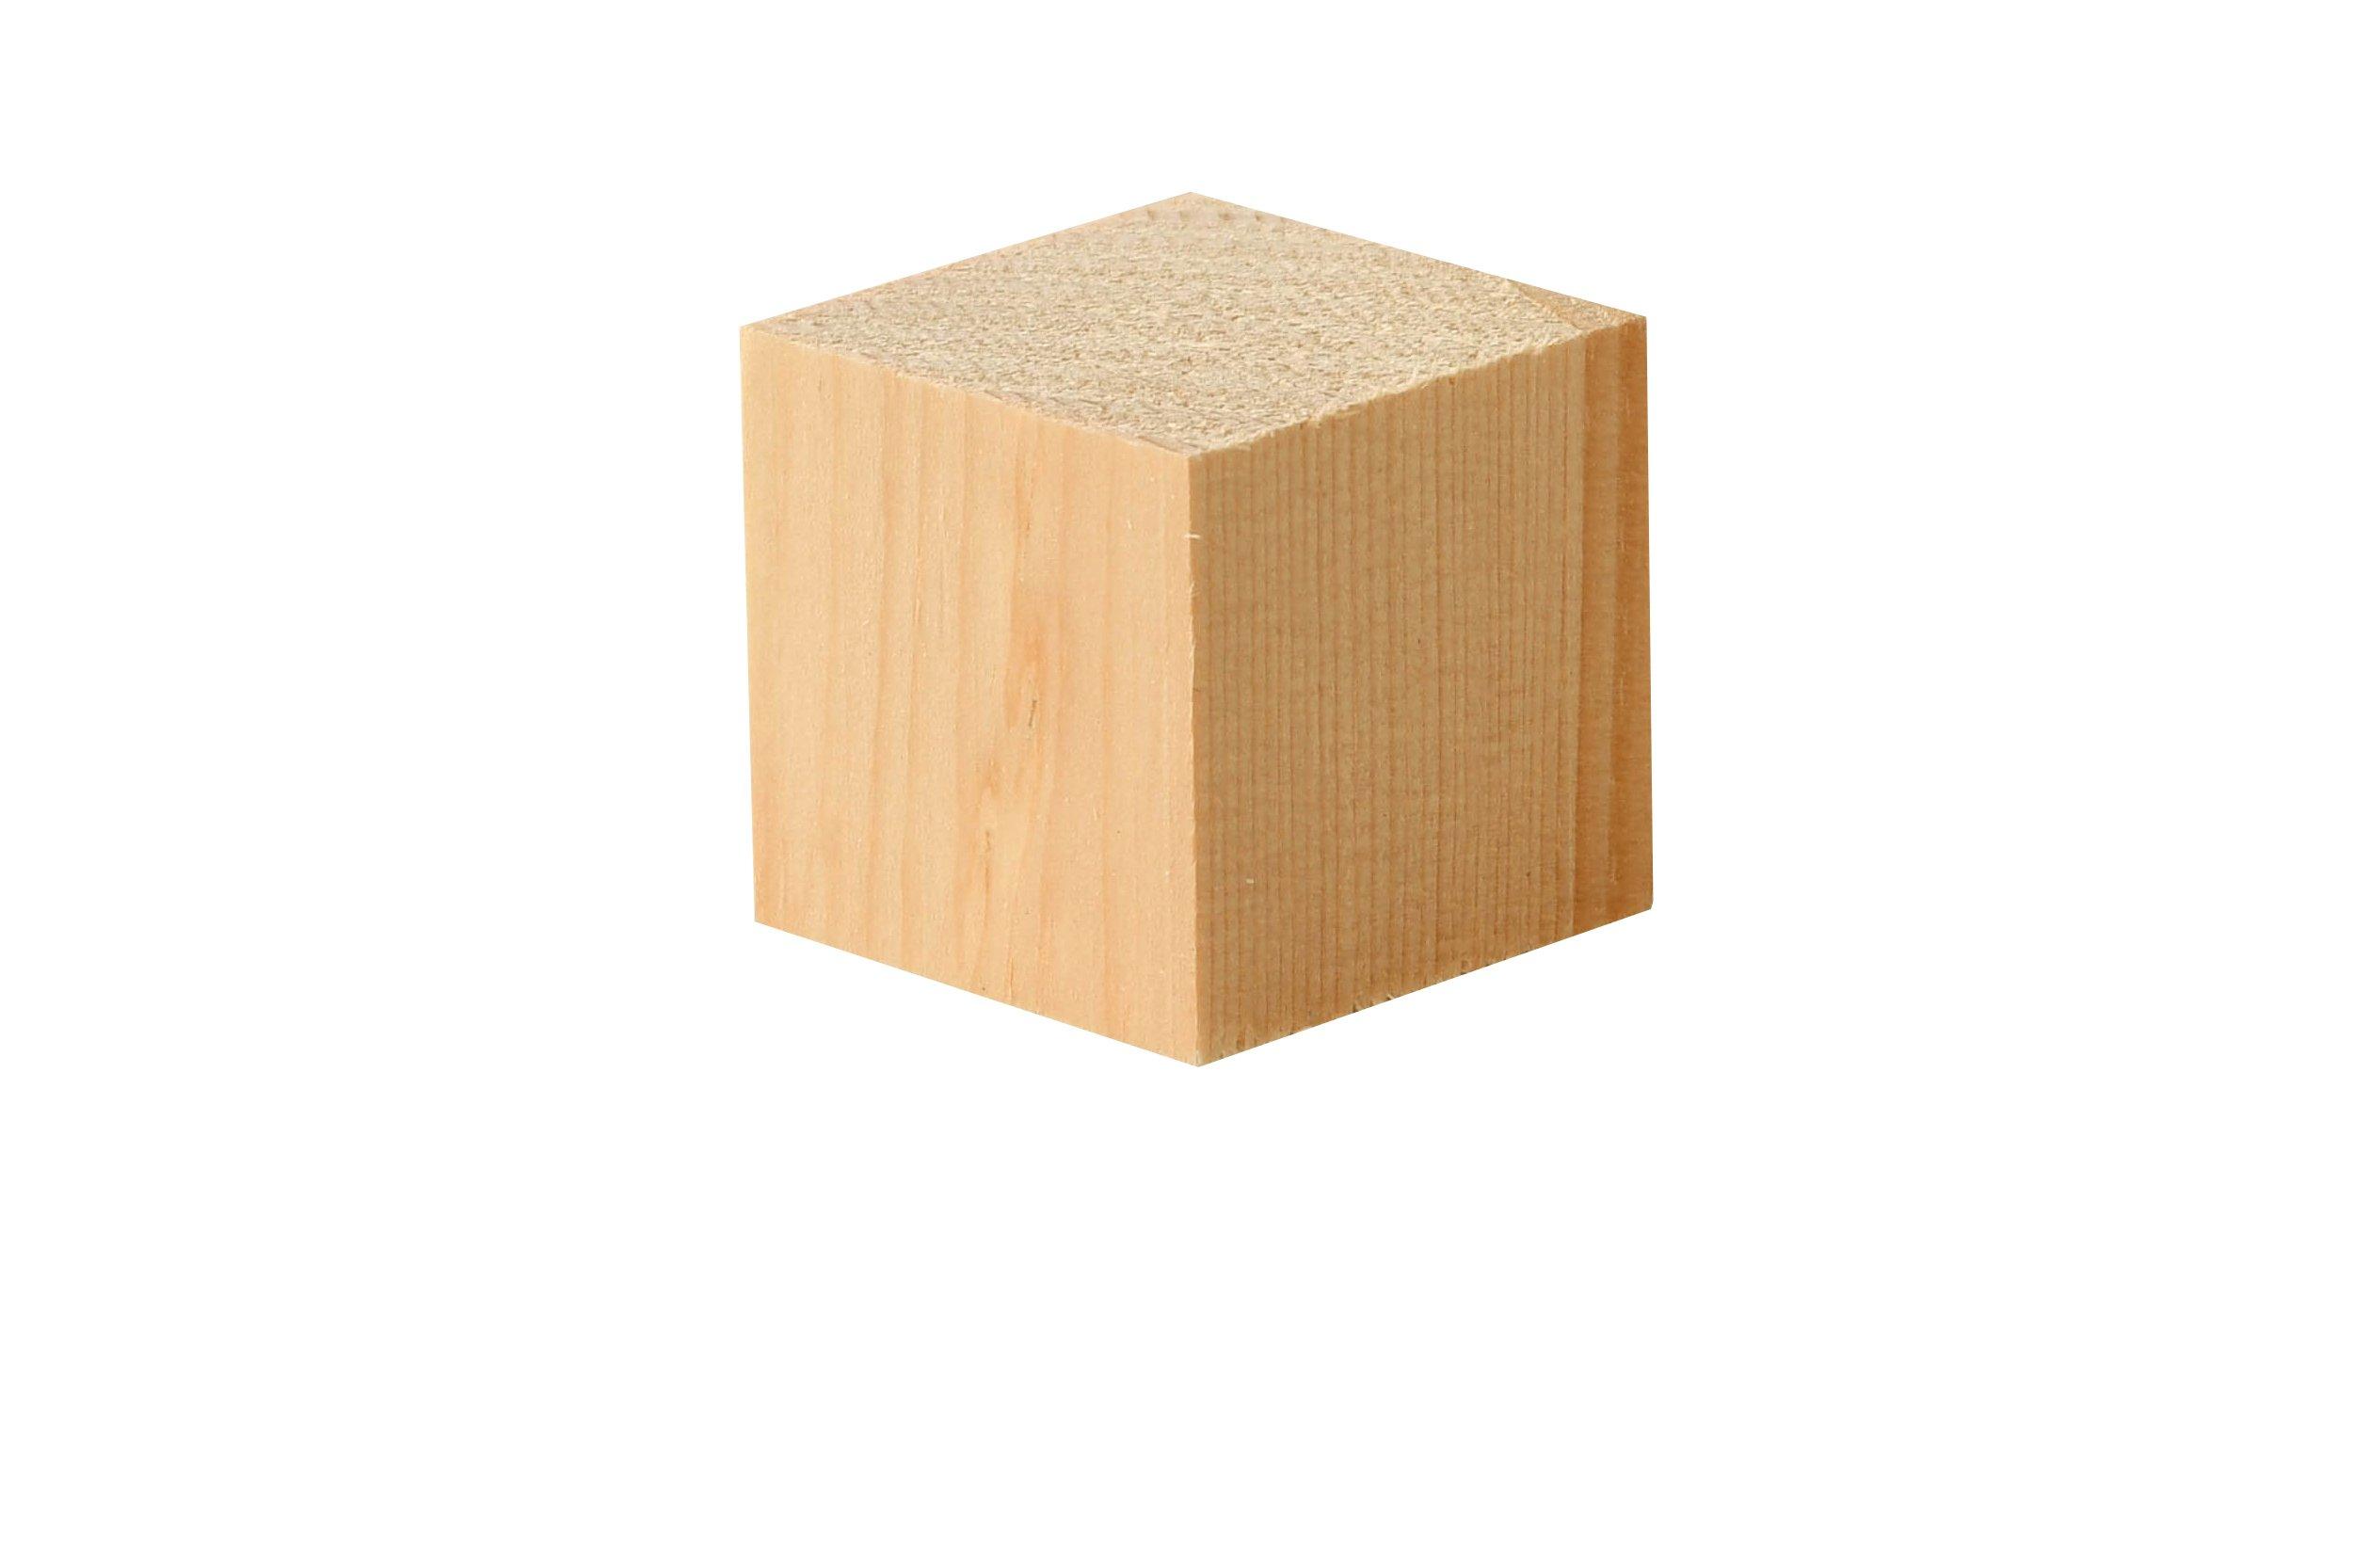 Houten blokjes alpenden, 50 st., 3x3x3 cm